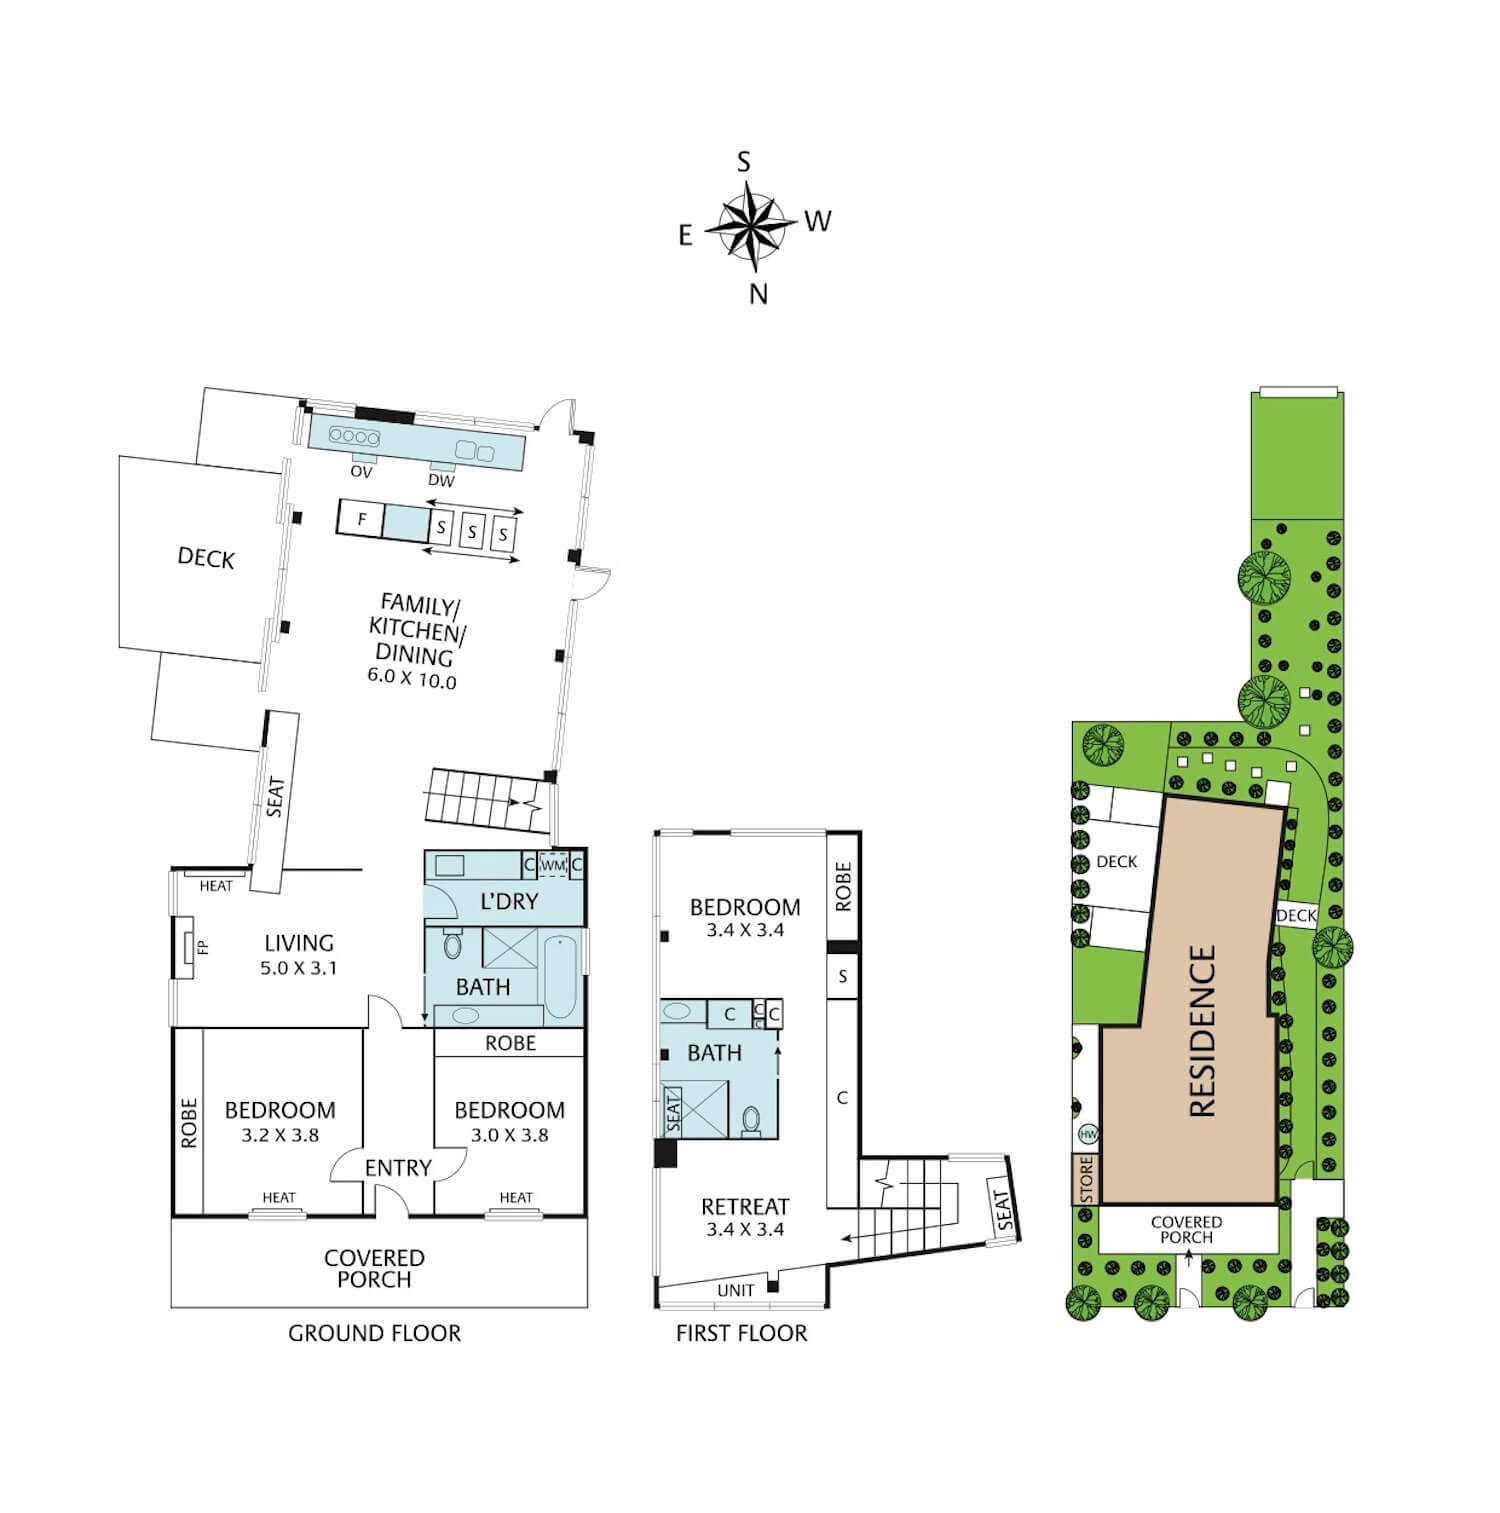 est living open house 228 edward street brunswick east floorplan